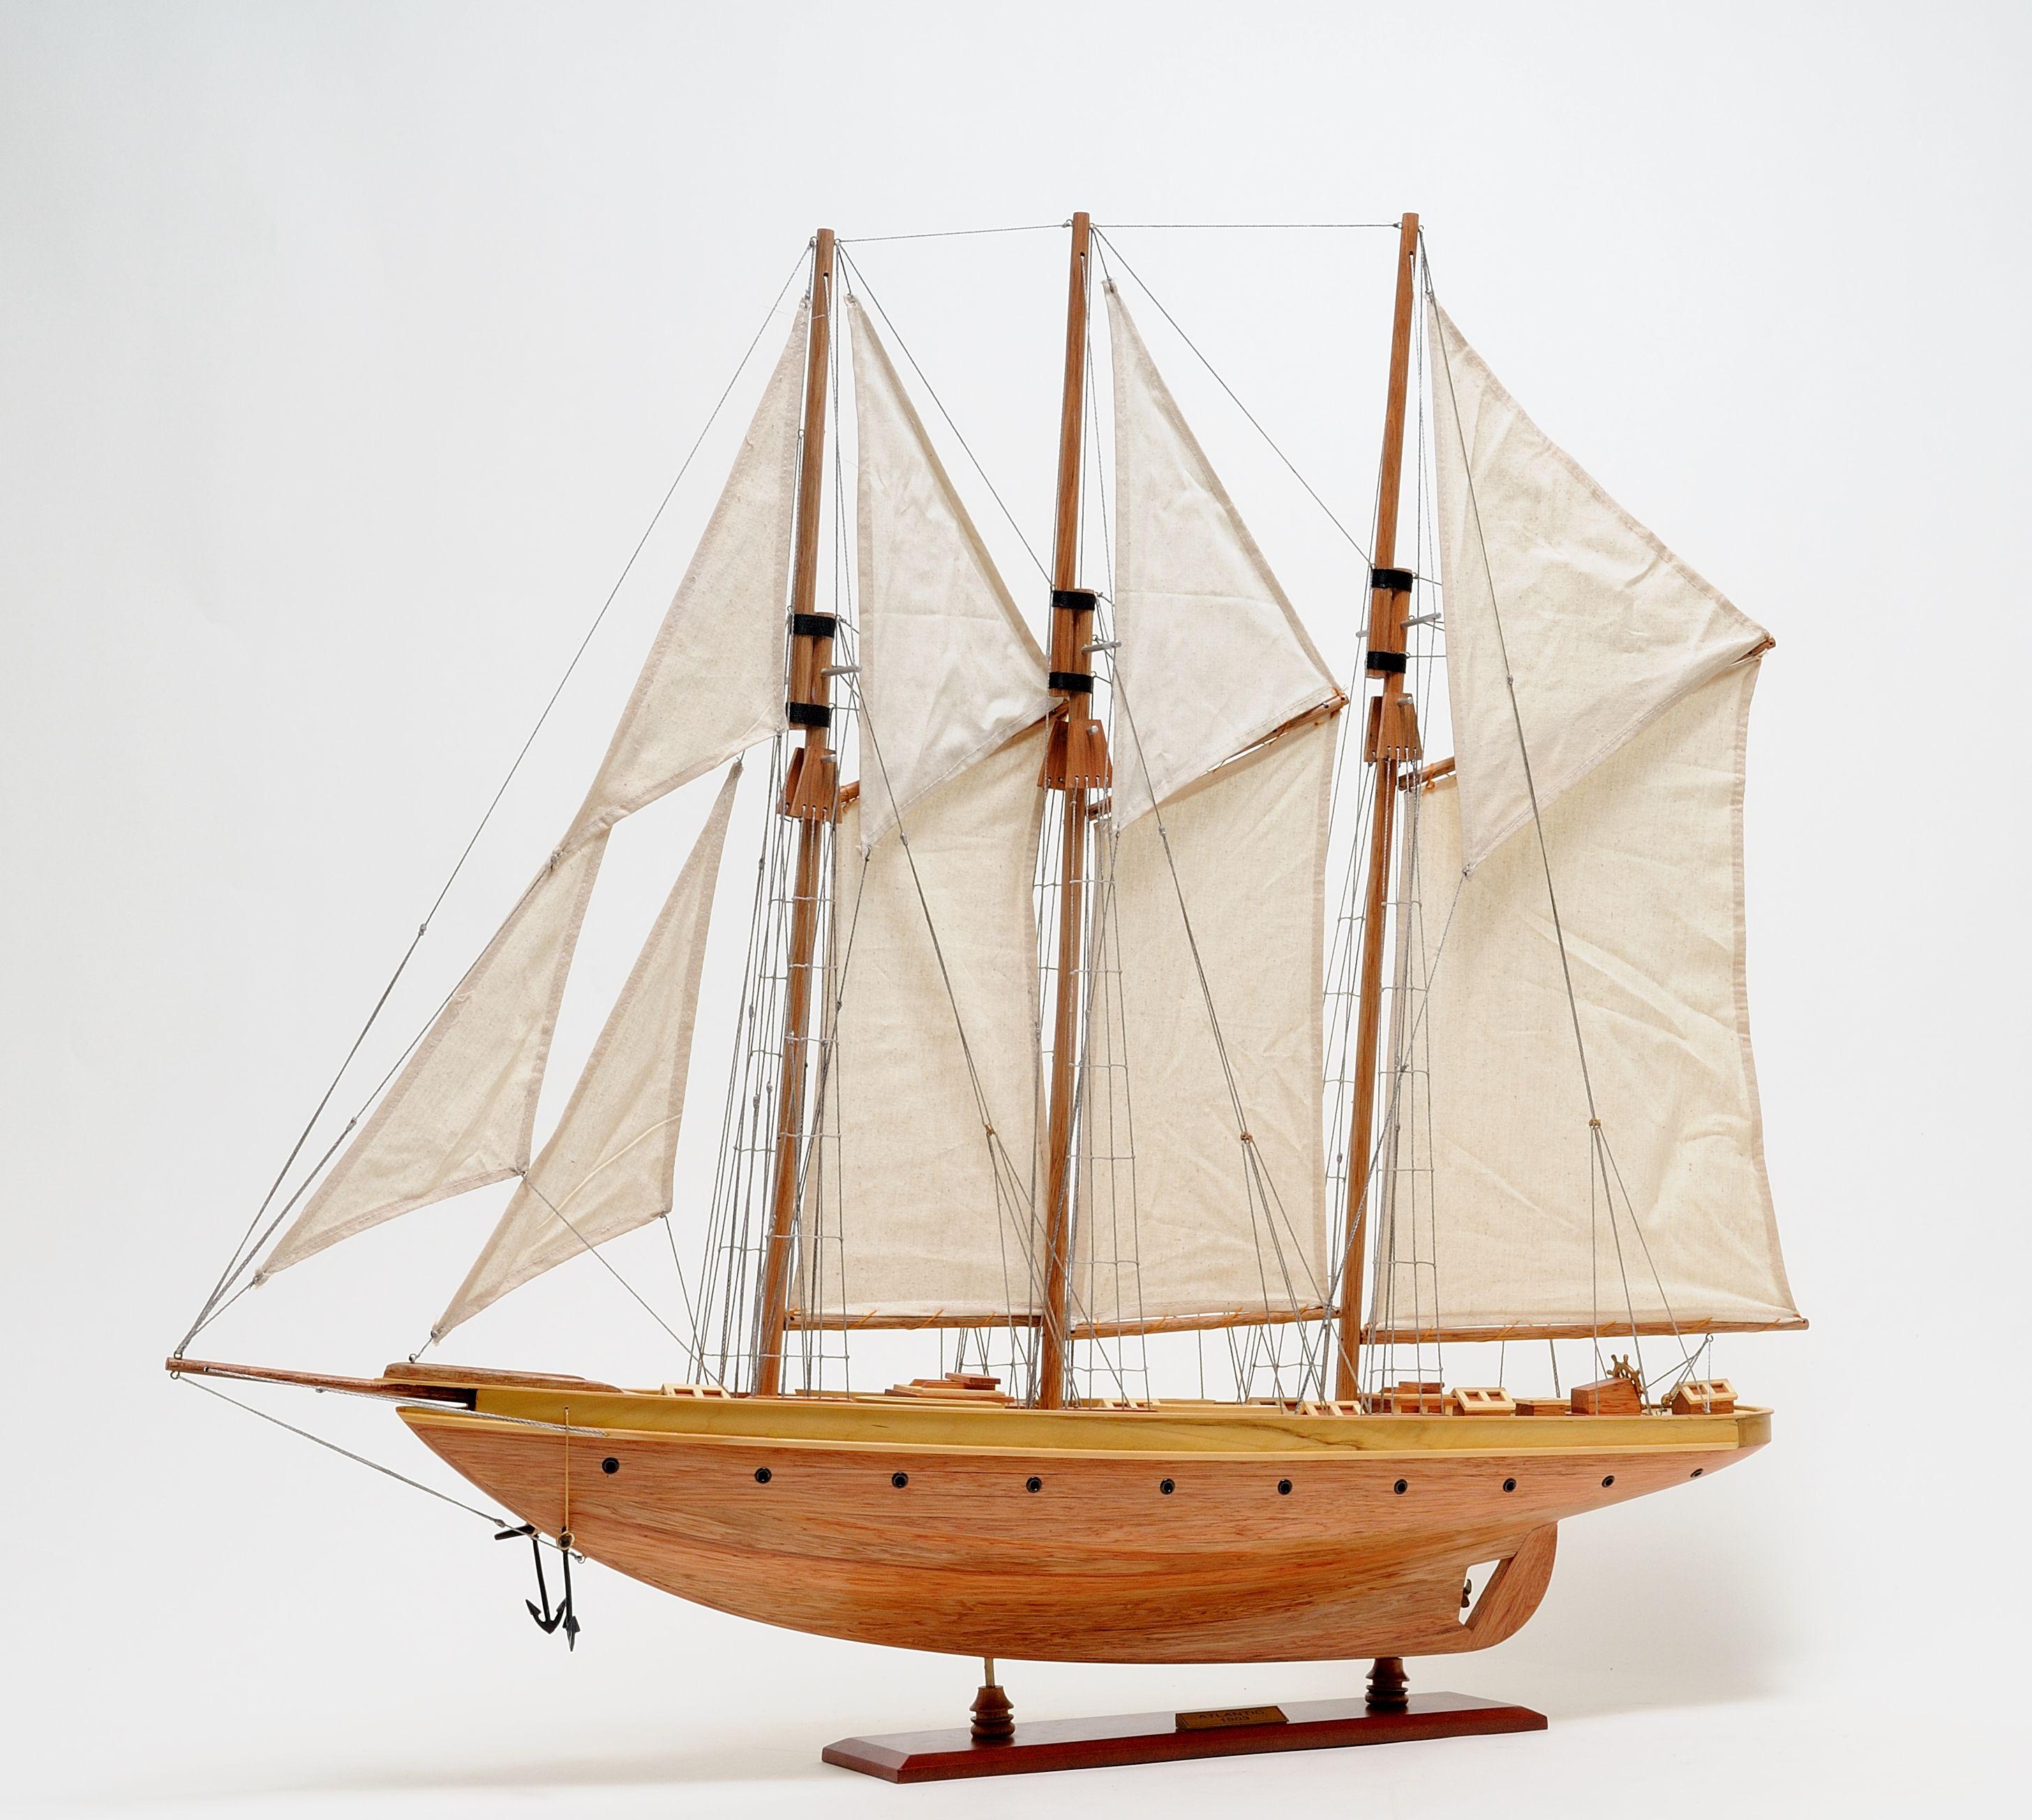 2278-13028-Atlantic-Model-Yacht